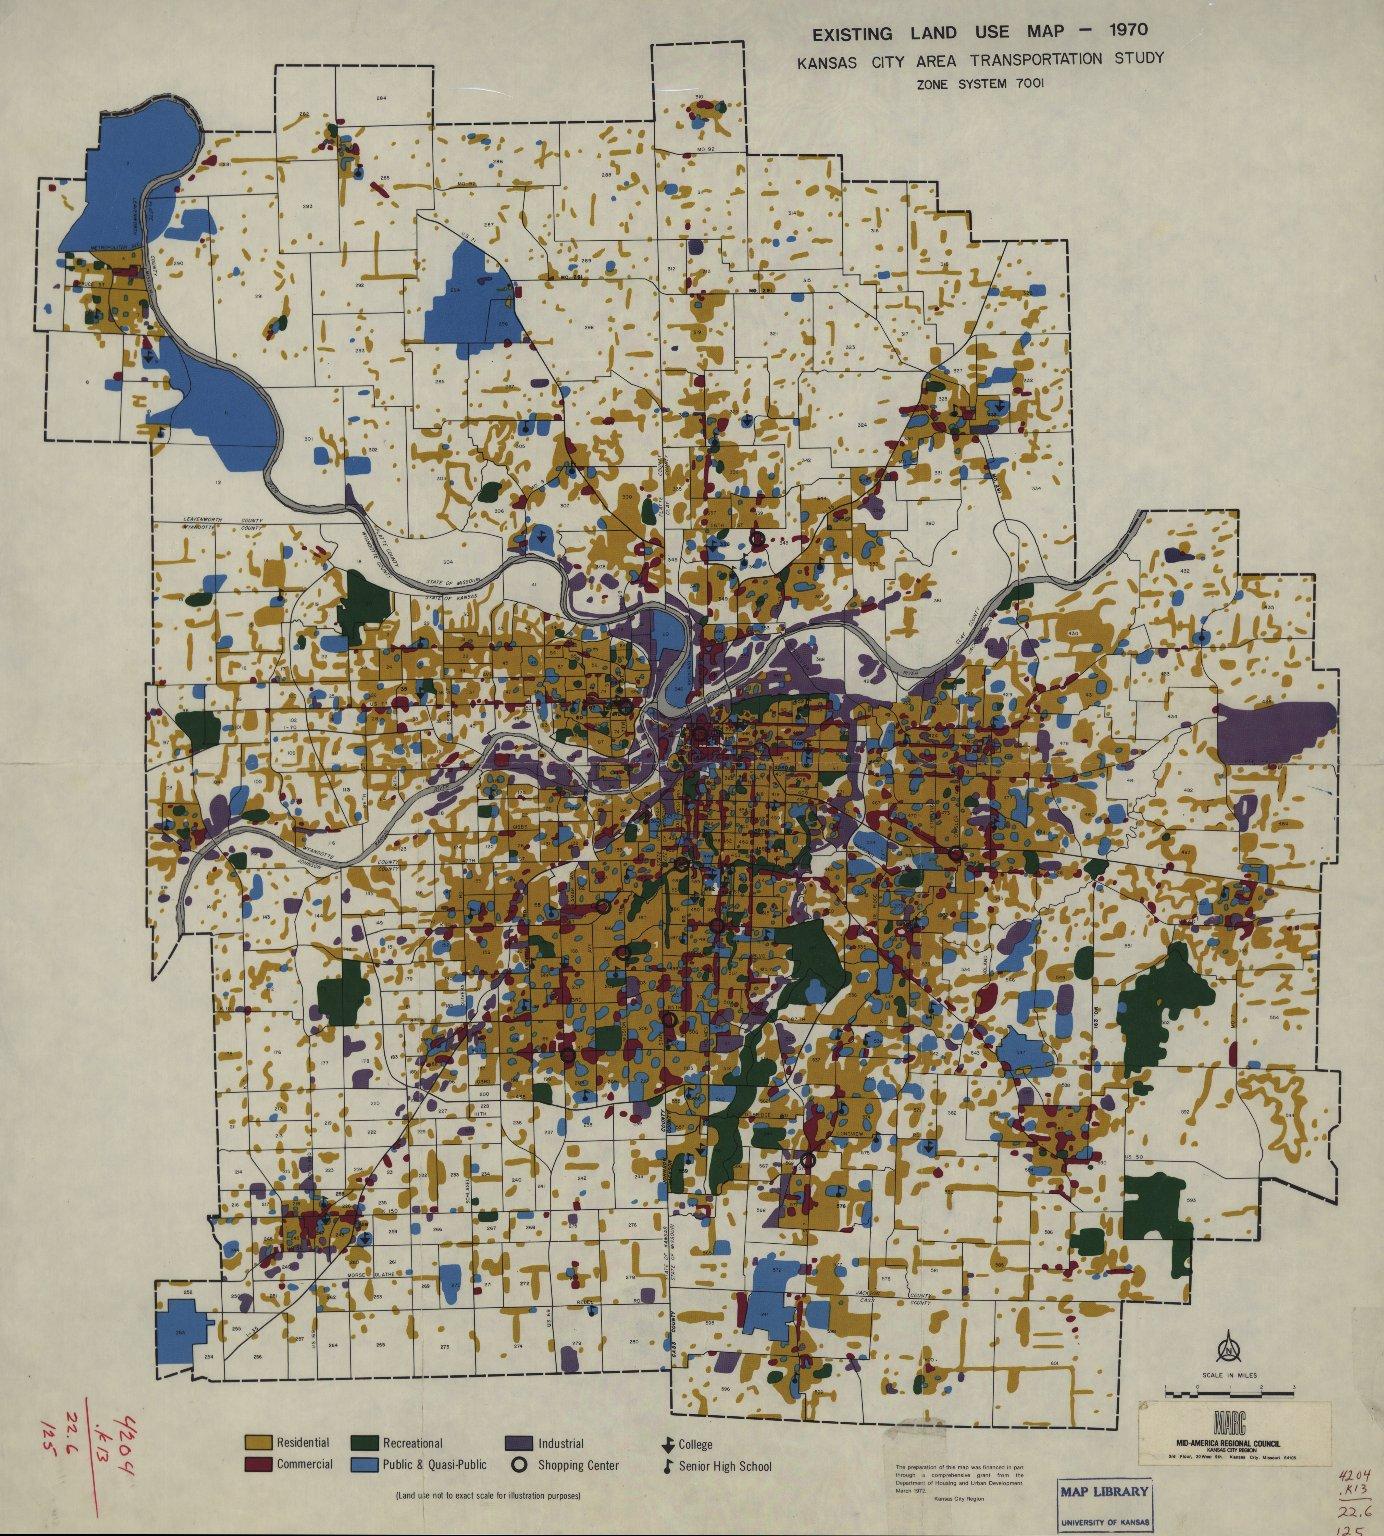 Kansas City area transportation study